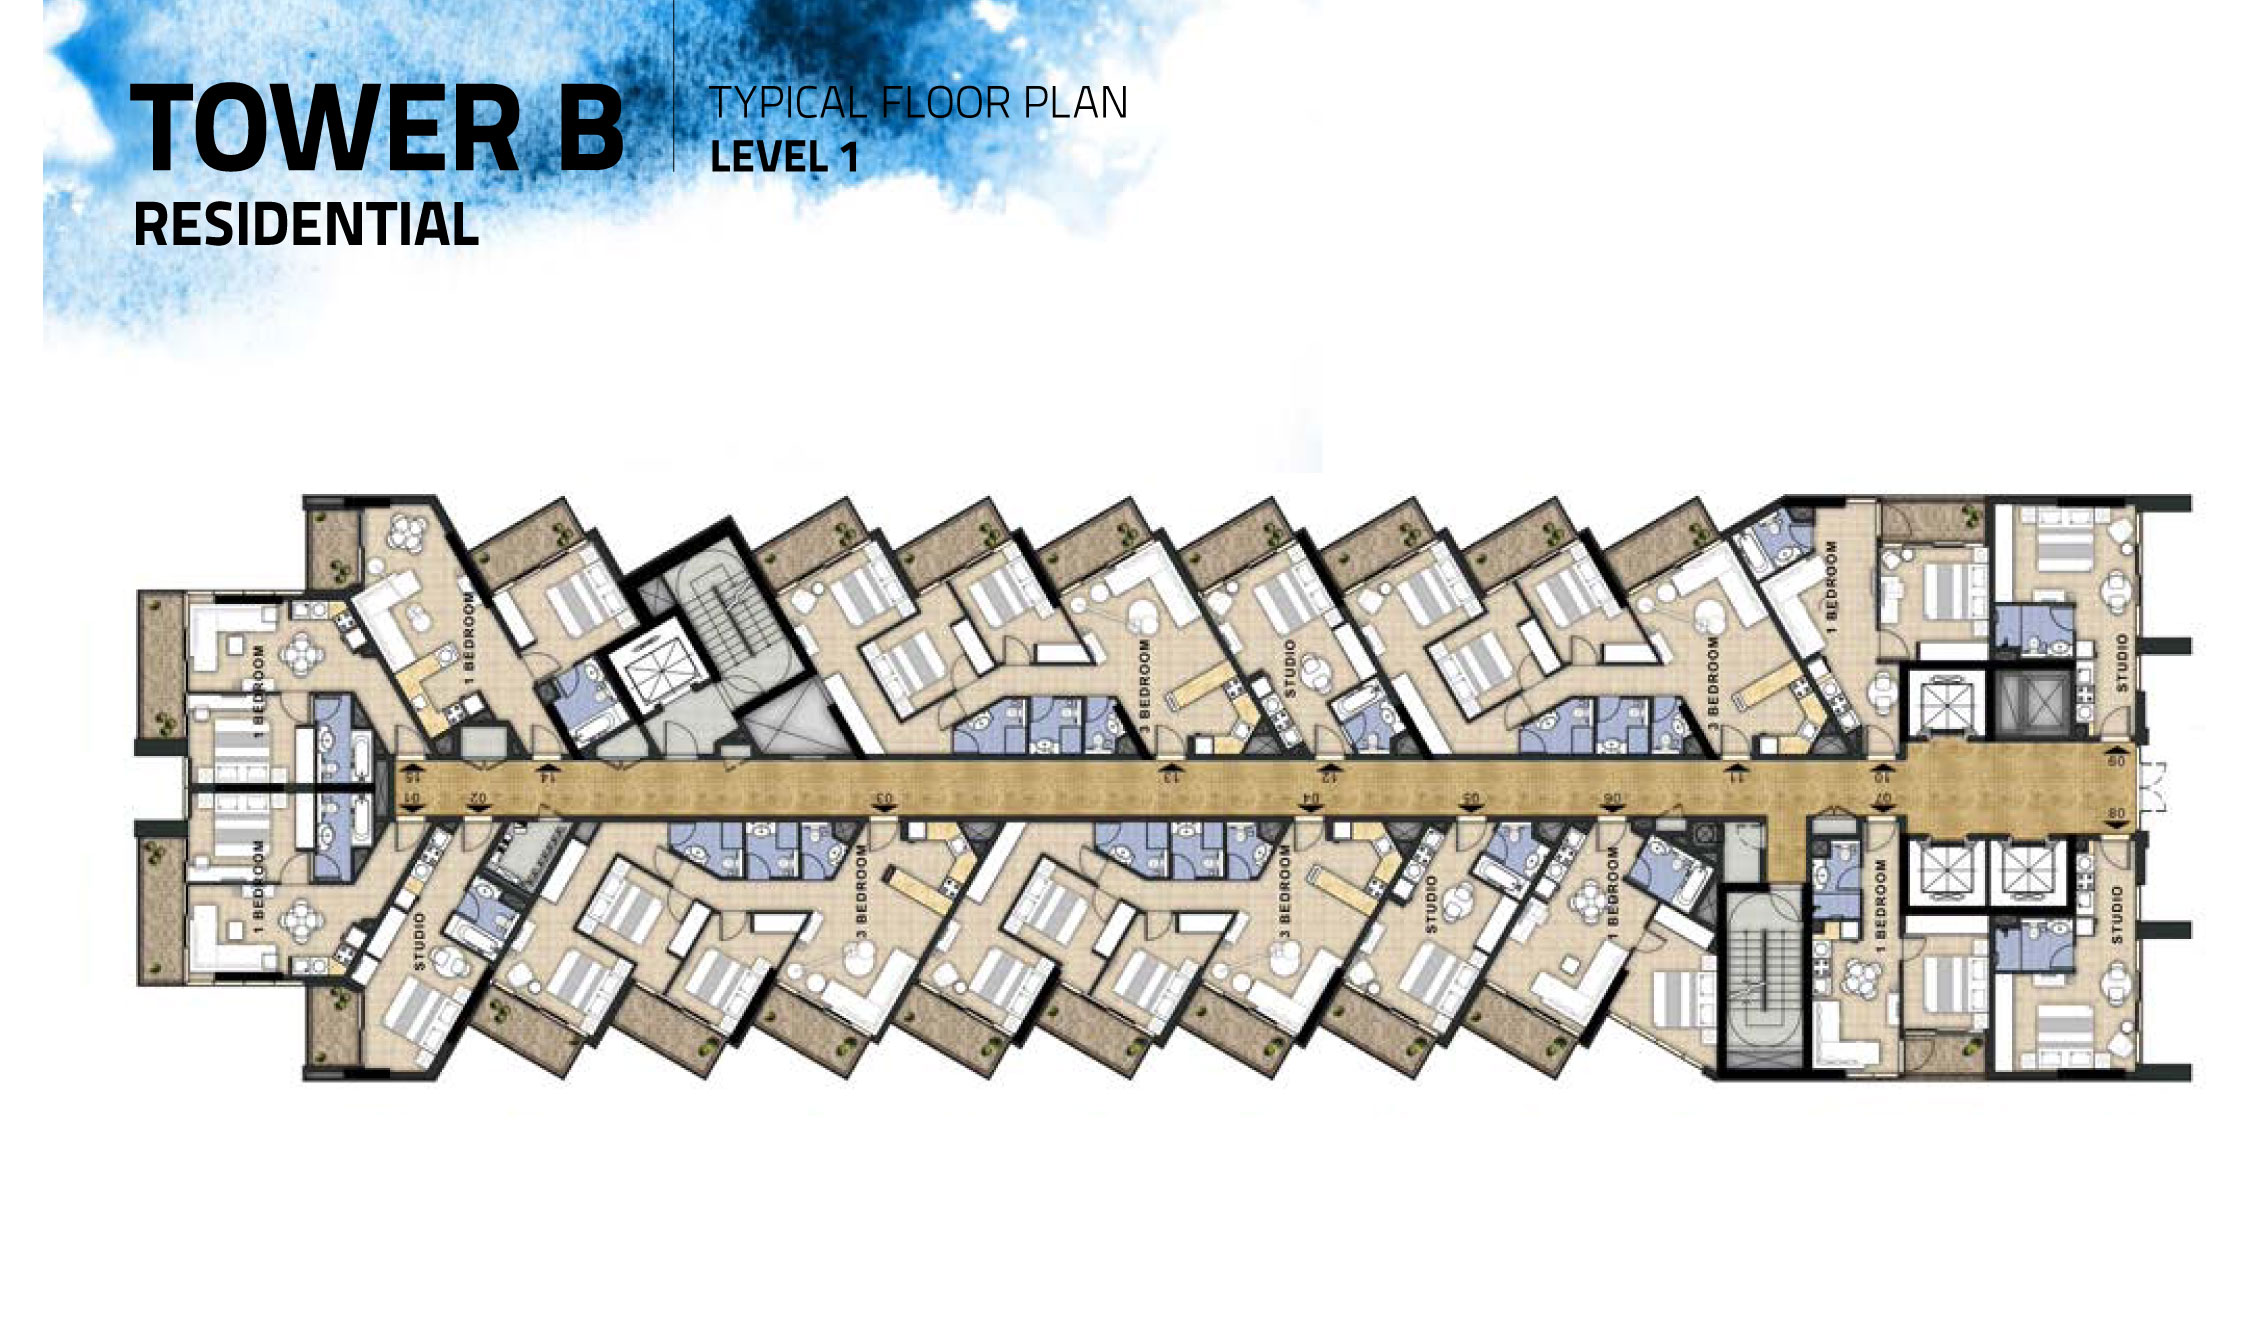 Tower-B-Level-1